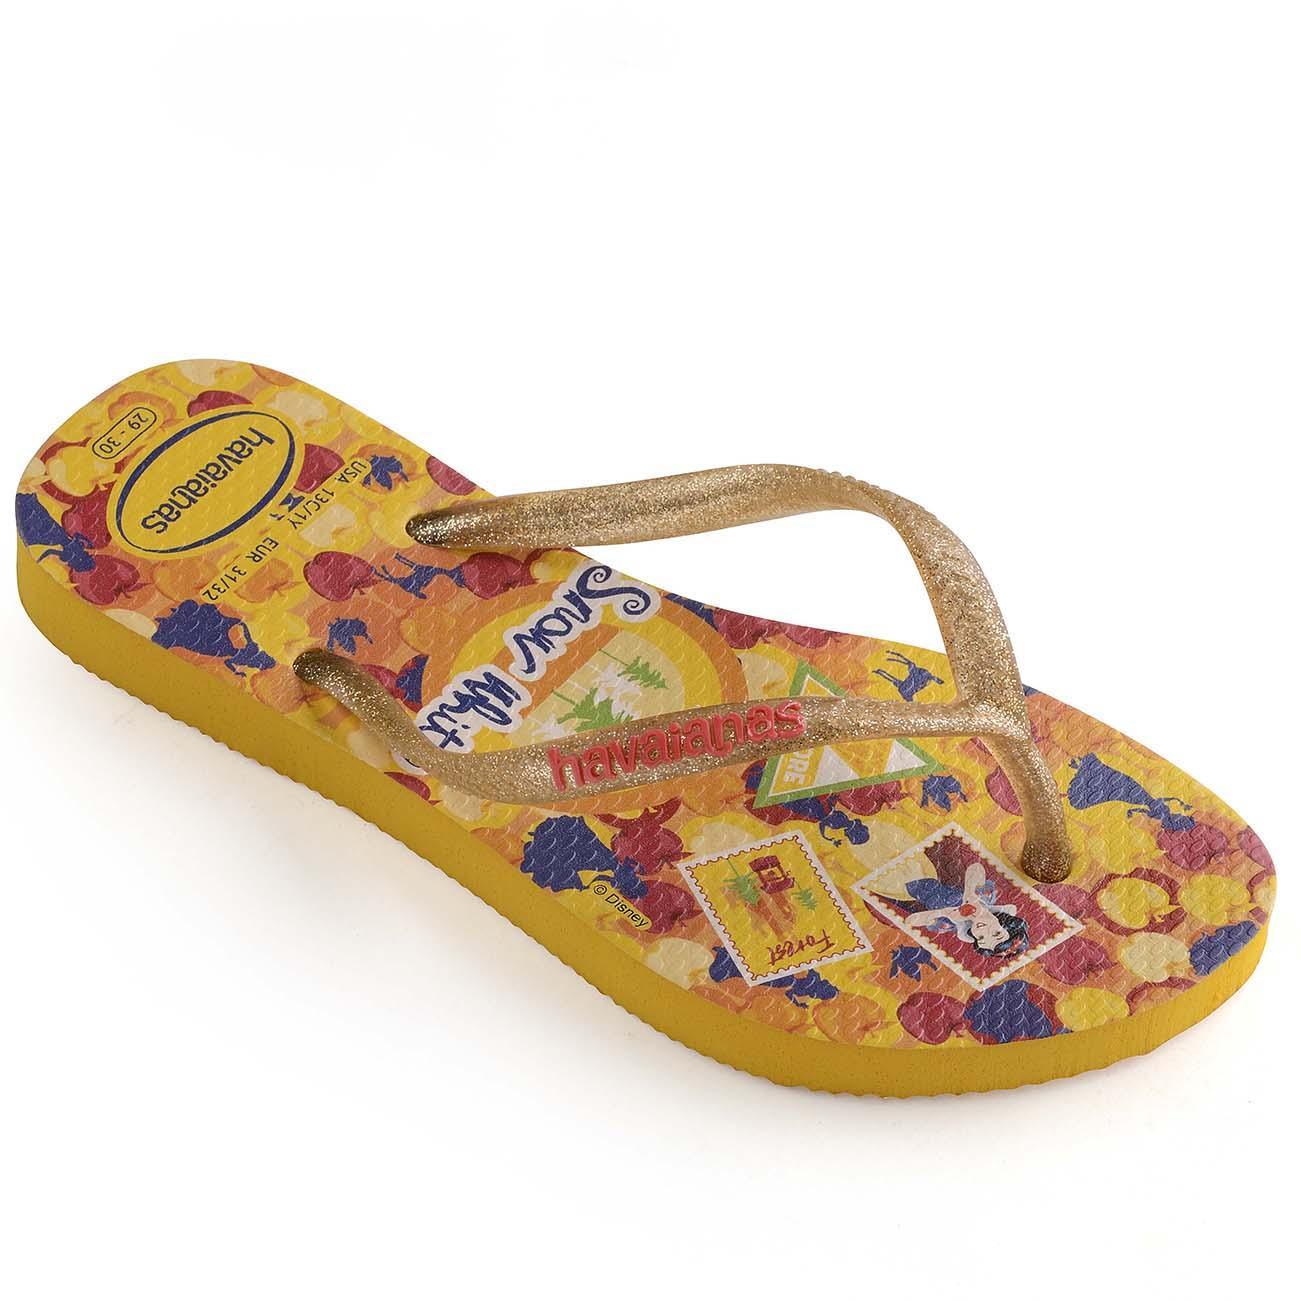 73b47786 Kids Girls Havaianas Slim Princess Lightweight Disney Rubber Flip Flops UK  8-4